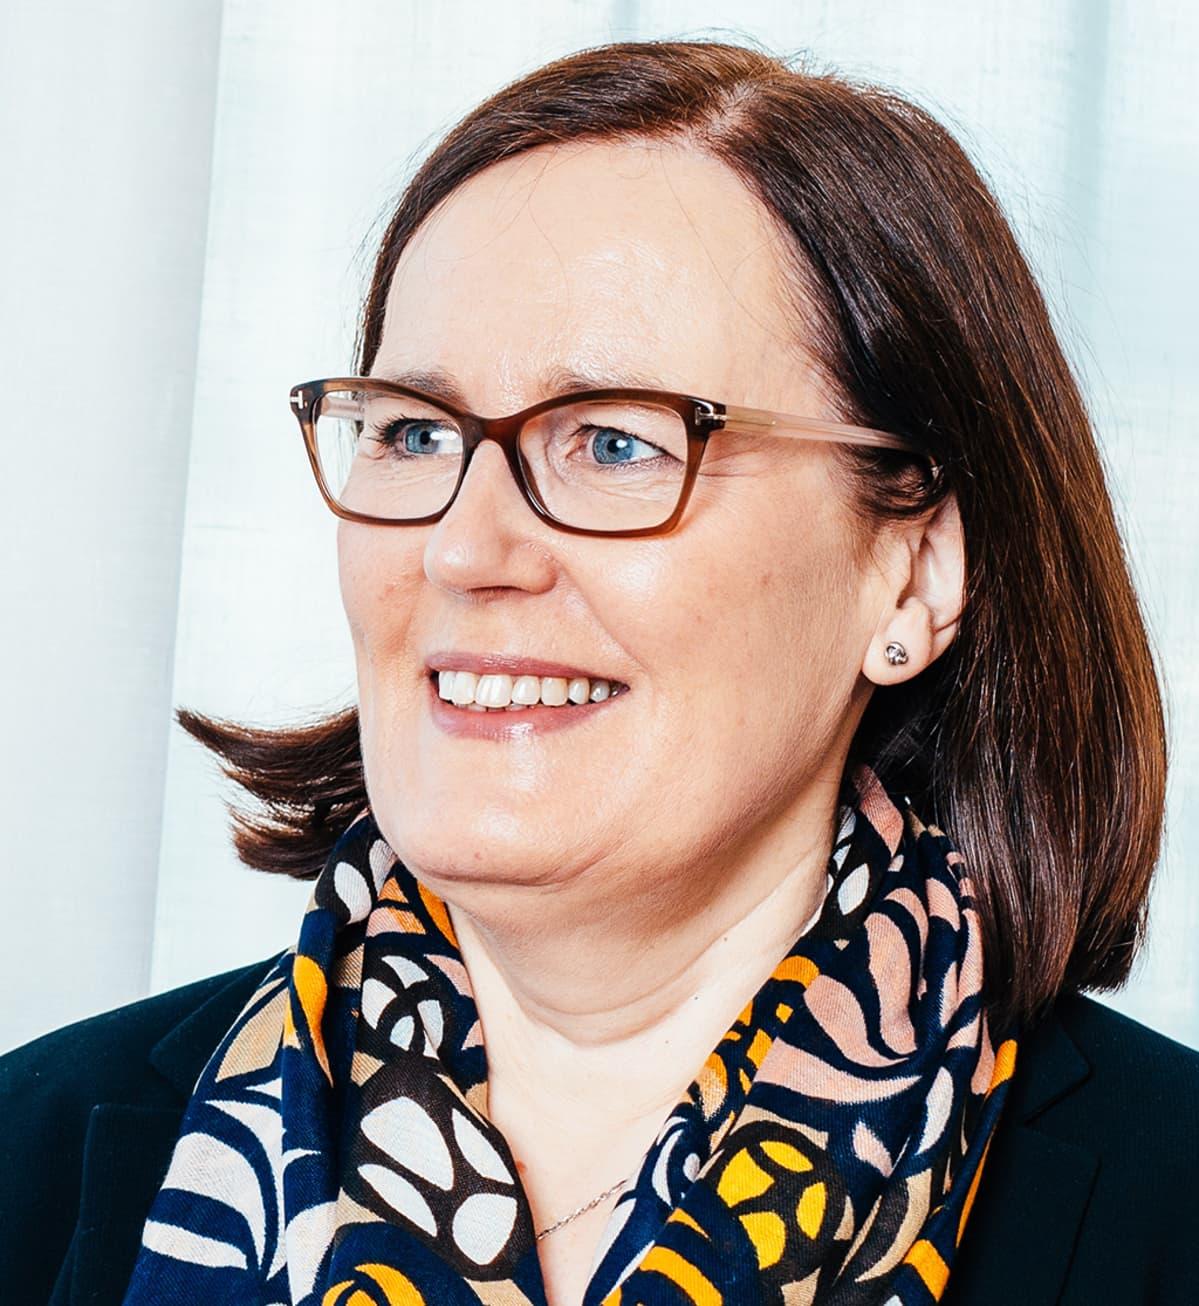 Liisa Heikinheimo